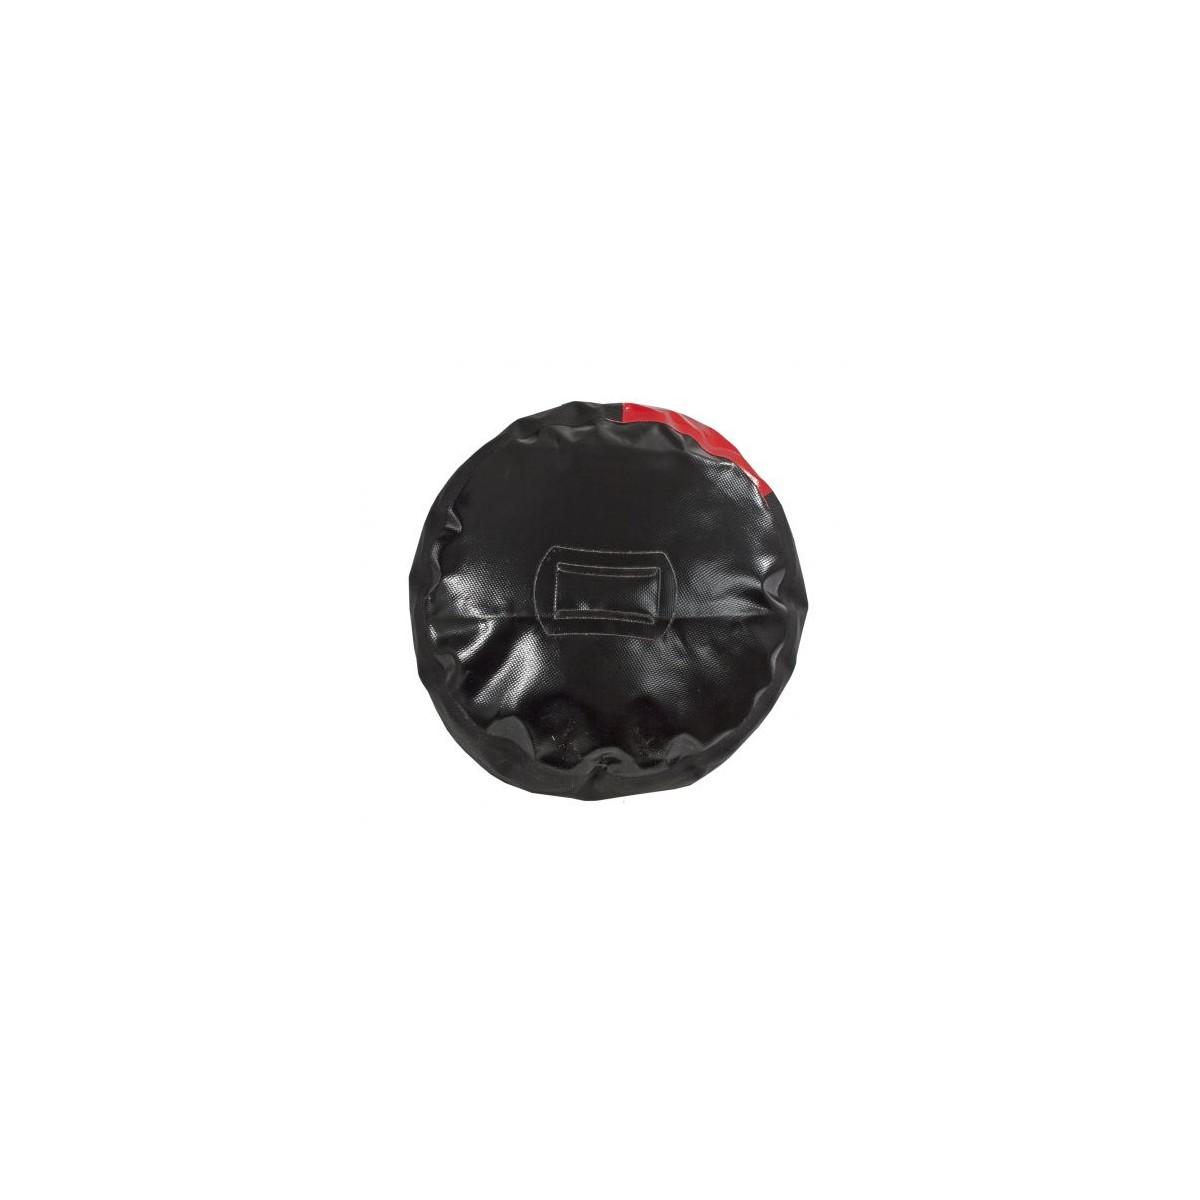 Ūdensdrošie maisi un iepakojumi Ortlieb PS 490 59 L